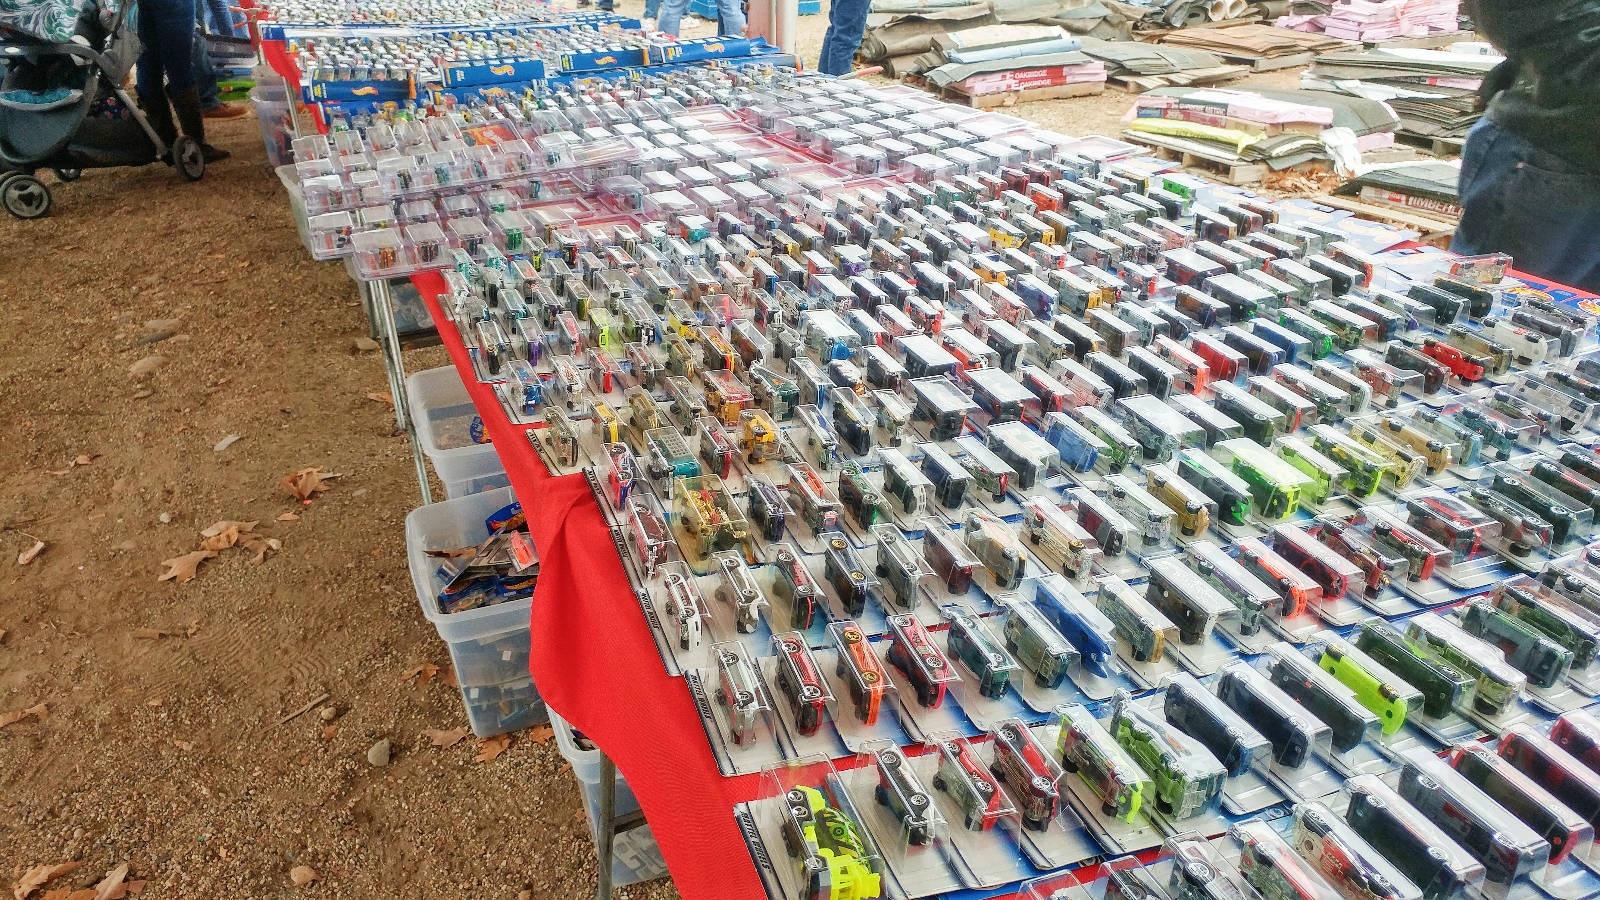 10 000 Hot Wheels At Estate Sale